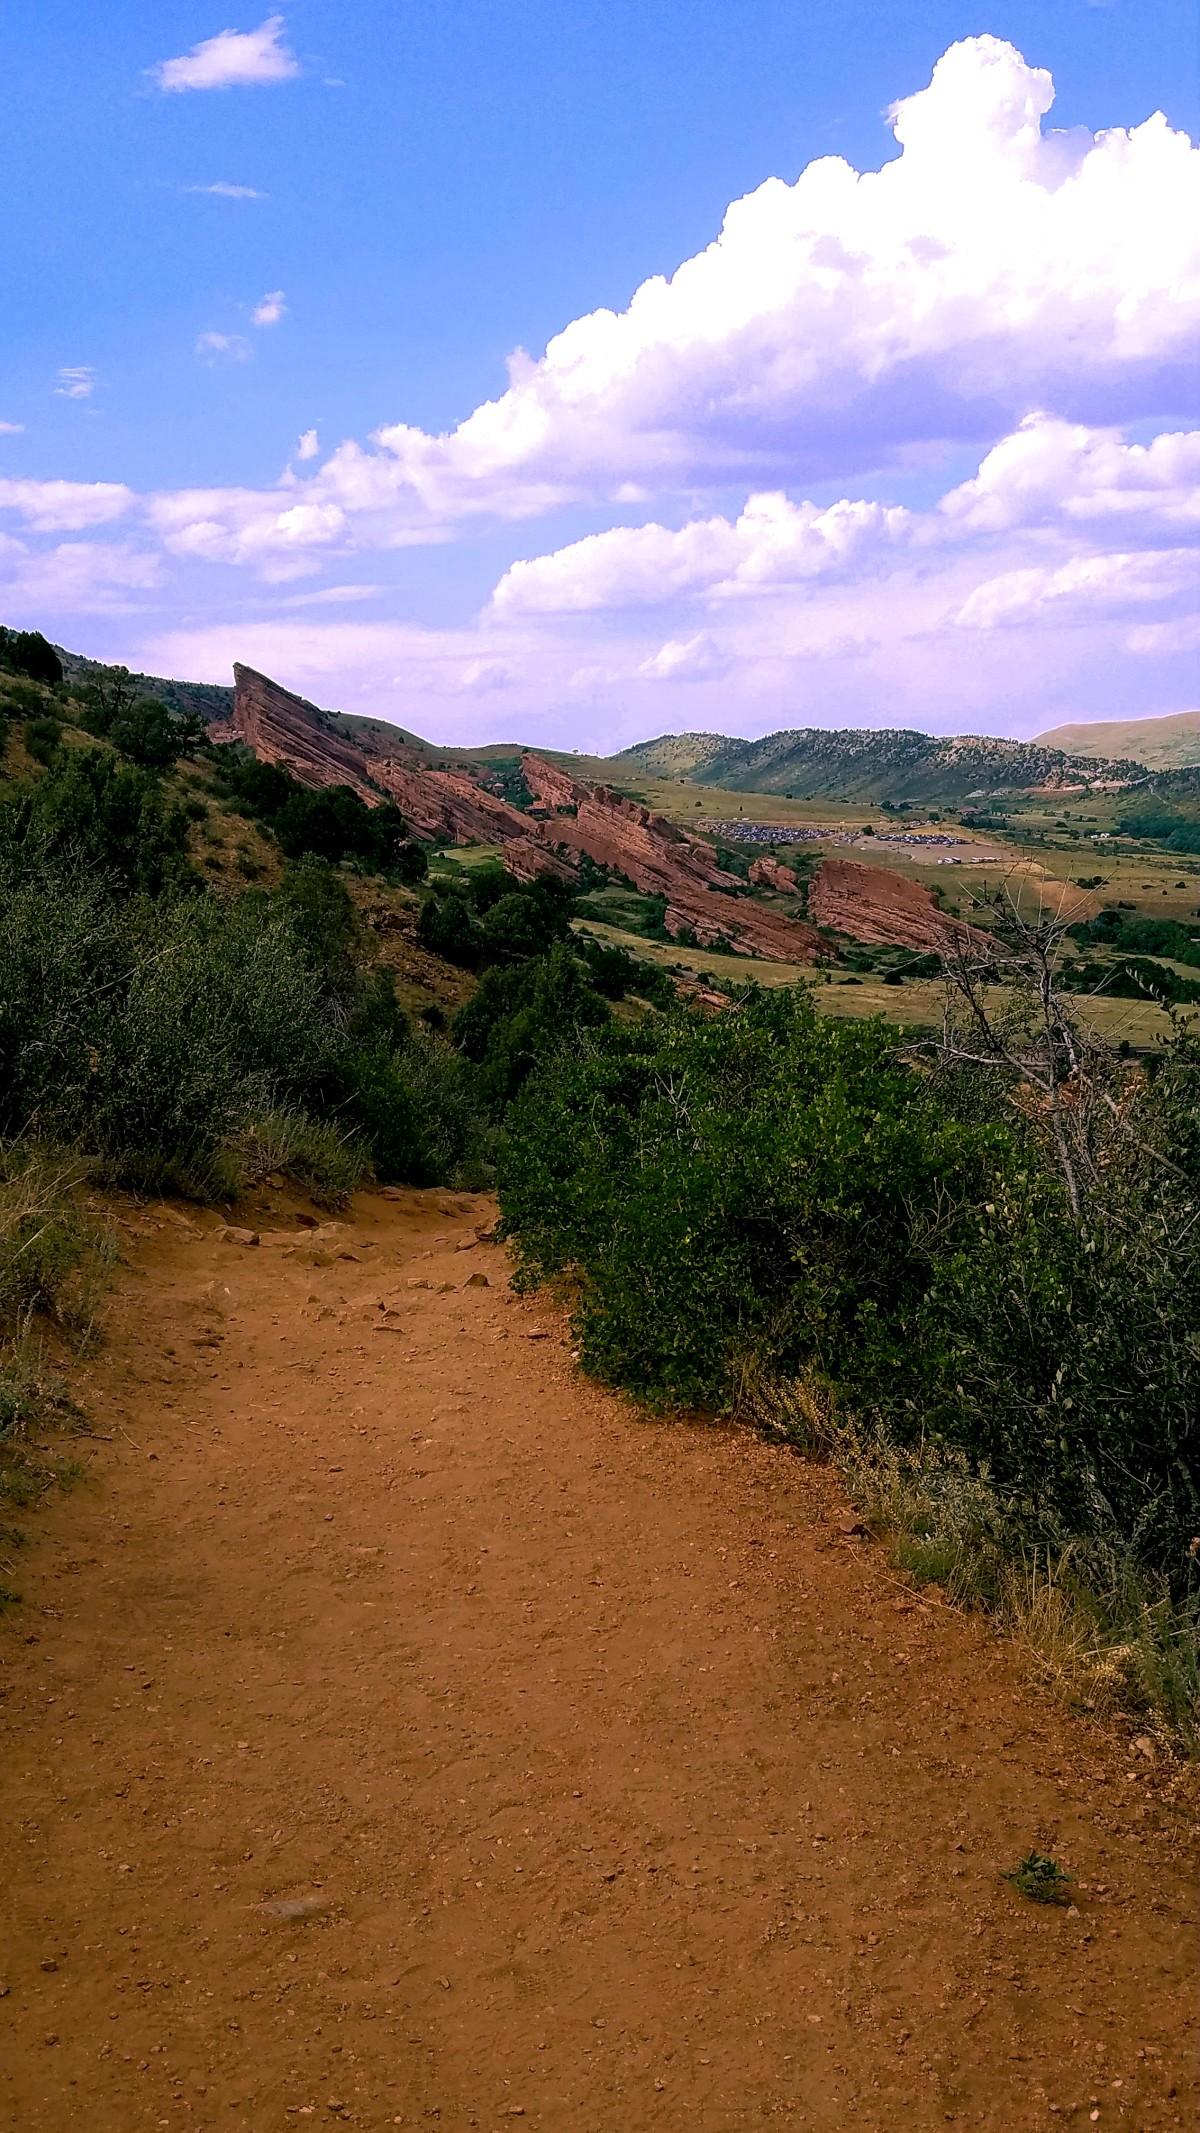 Mount Falcon